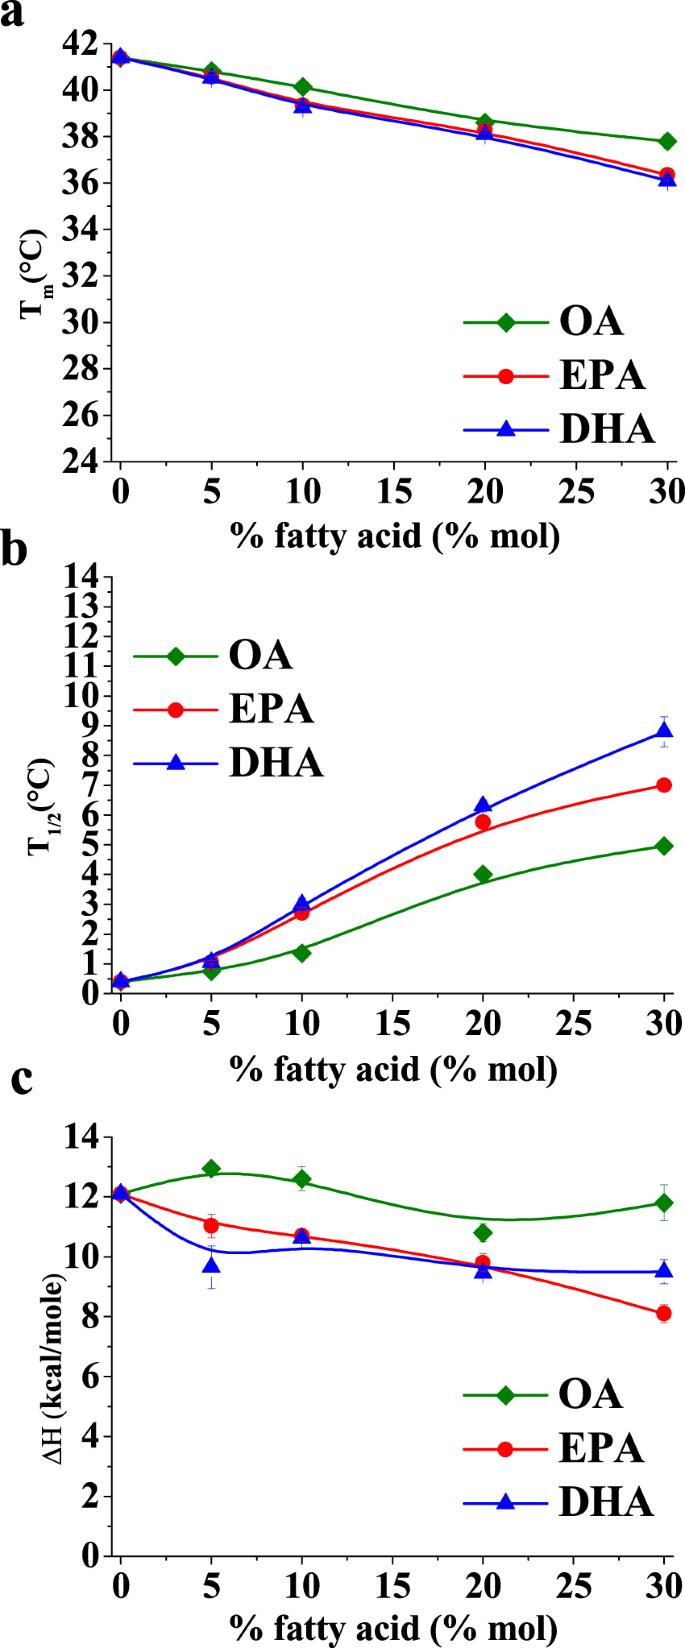 Omega-3 polyunsaturated fatty acids do not fluidify bilayers